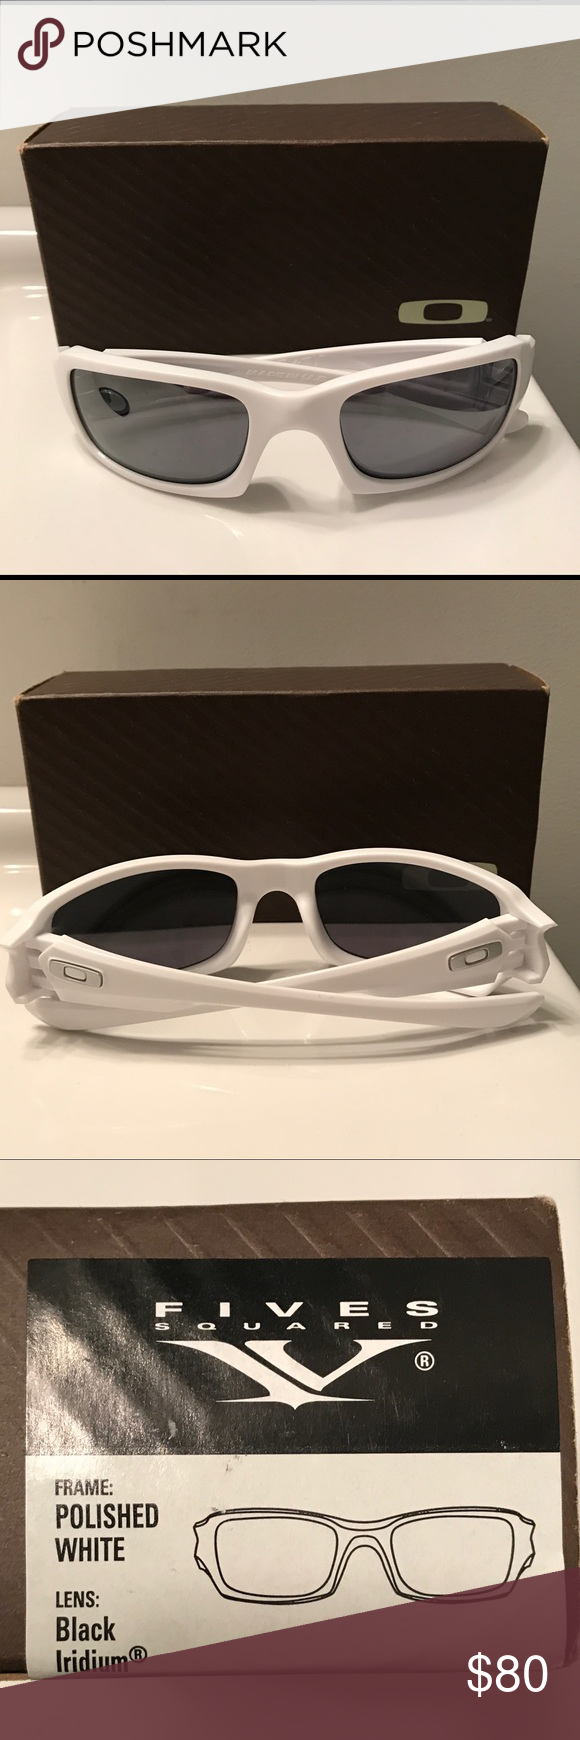 982d2df253 Oakley Fives Squared Sunglasses- Polished White Oakley Fives Squared 9079 Sunglasses  03-443 Polished White- Brand New Oakley Accessories Sunglasses